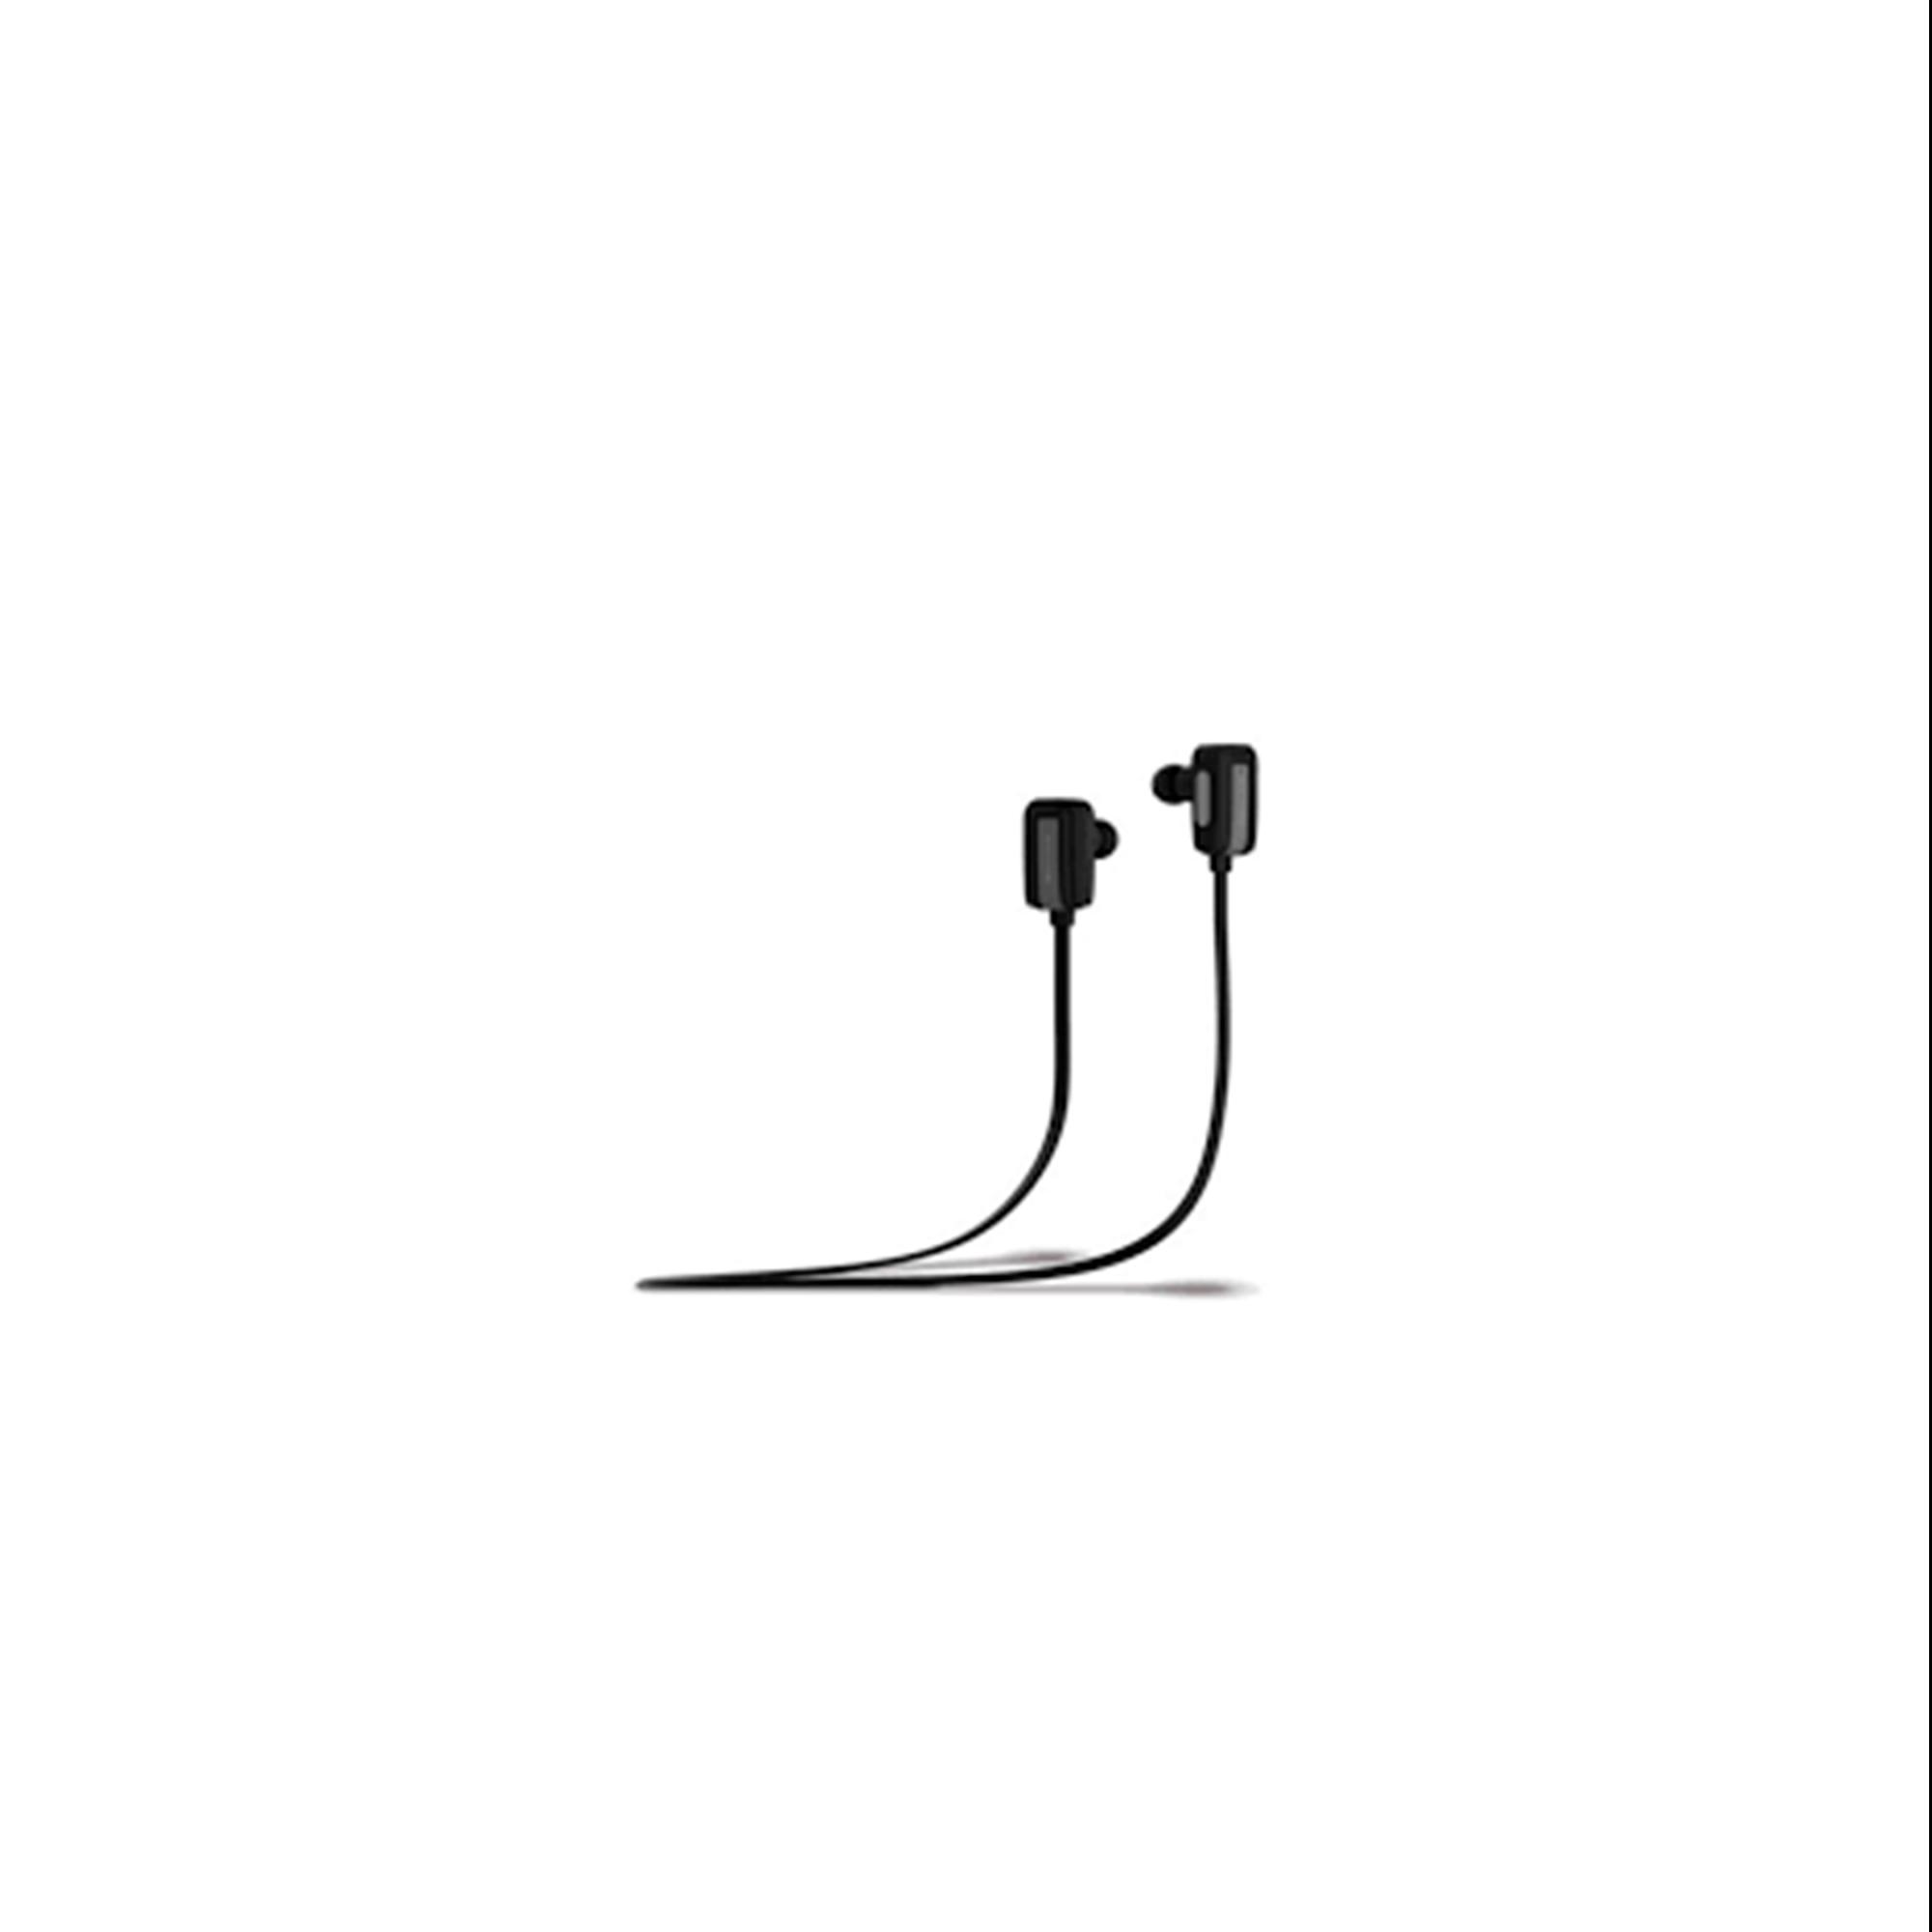 FONE BLUET. IPHONE V4.0 PH119 MULTILASER